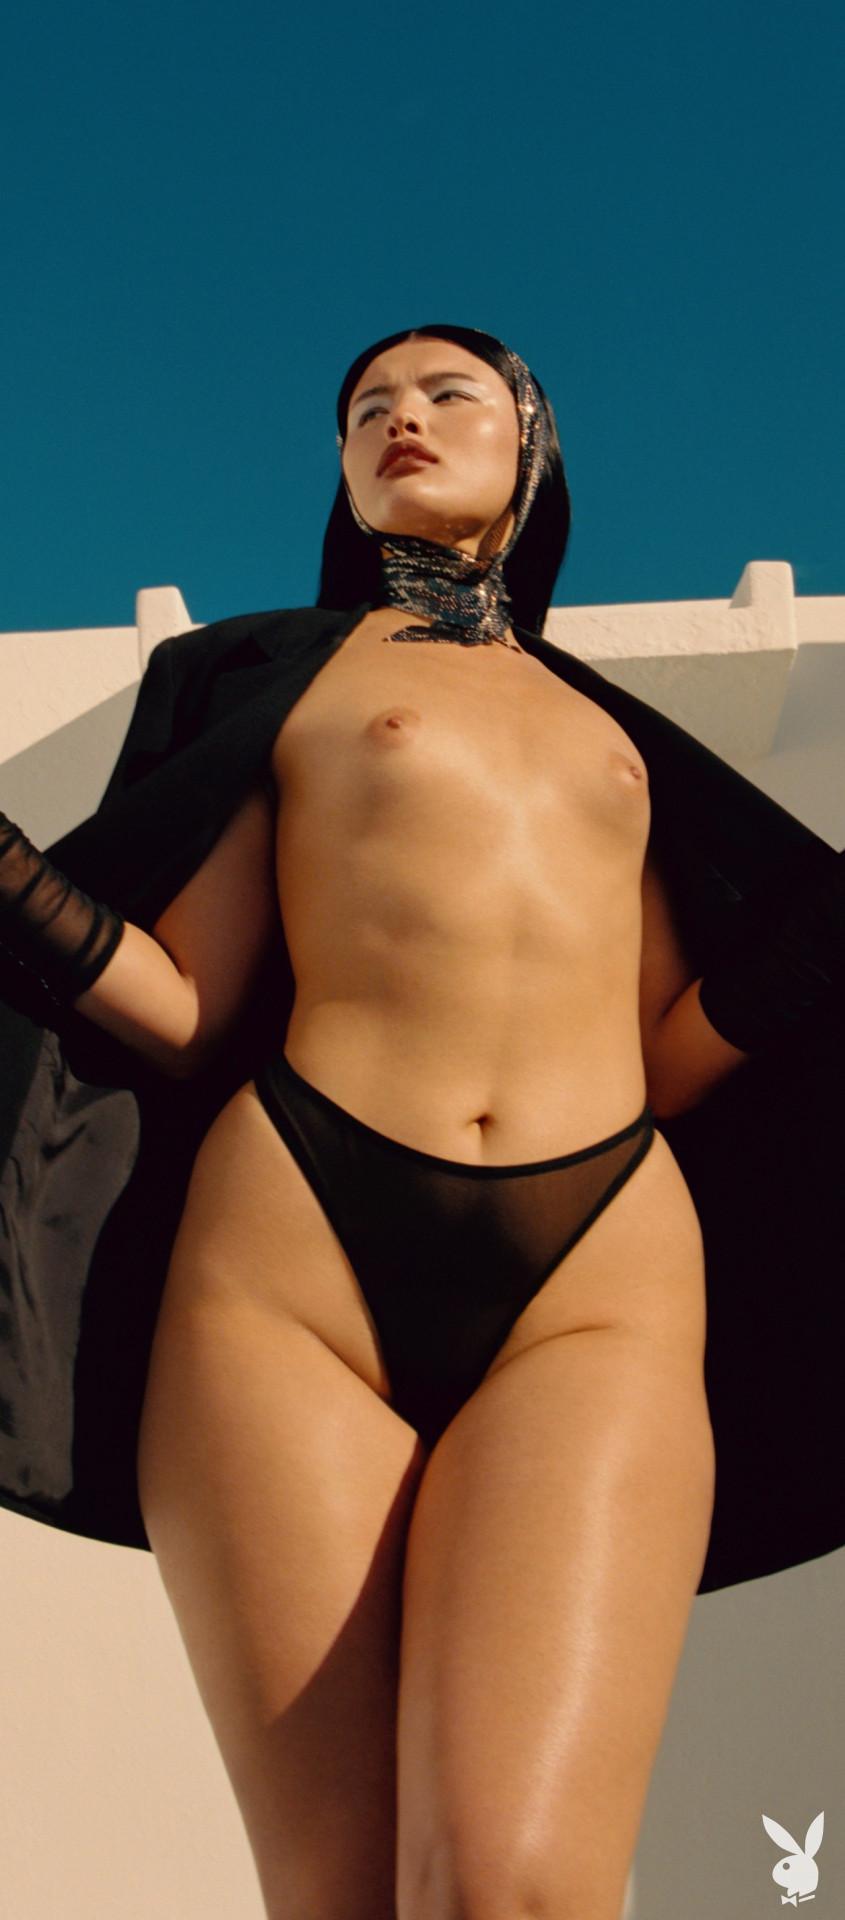 Playmate June 2020 Alicia Loraina Olivas Playboy Plus0003